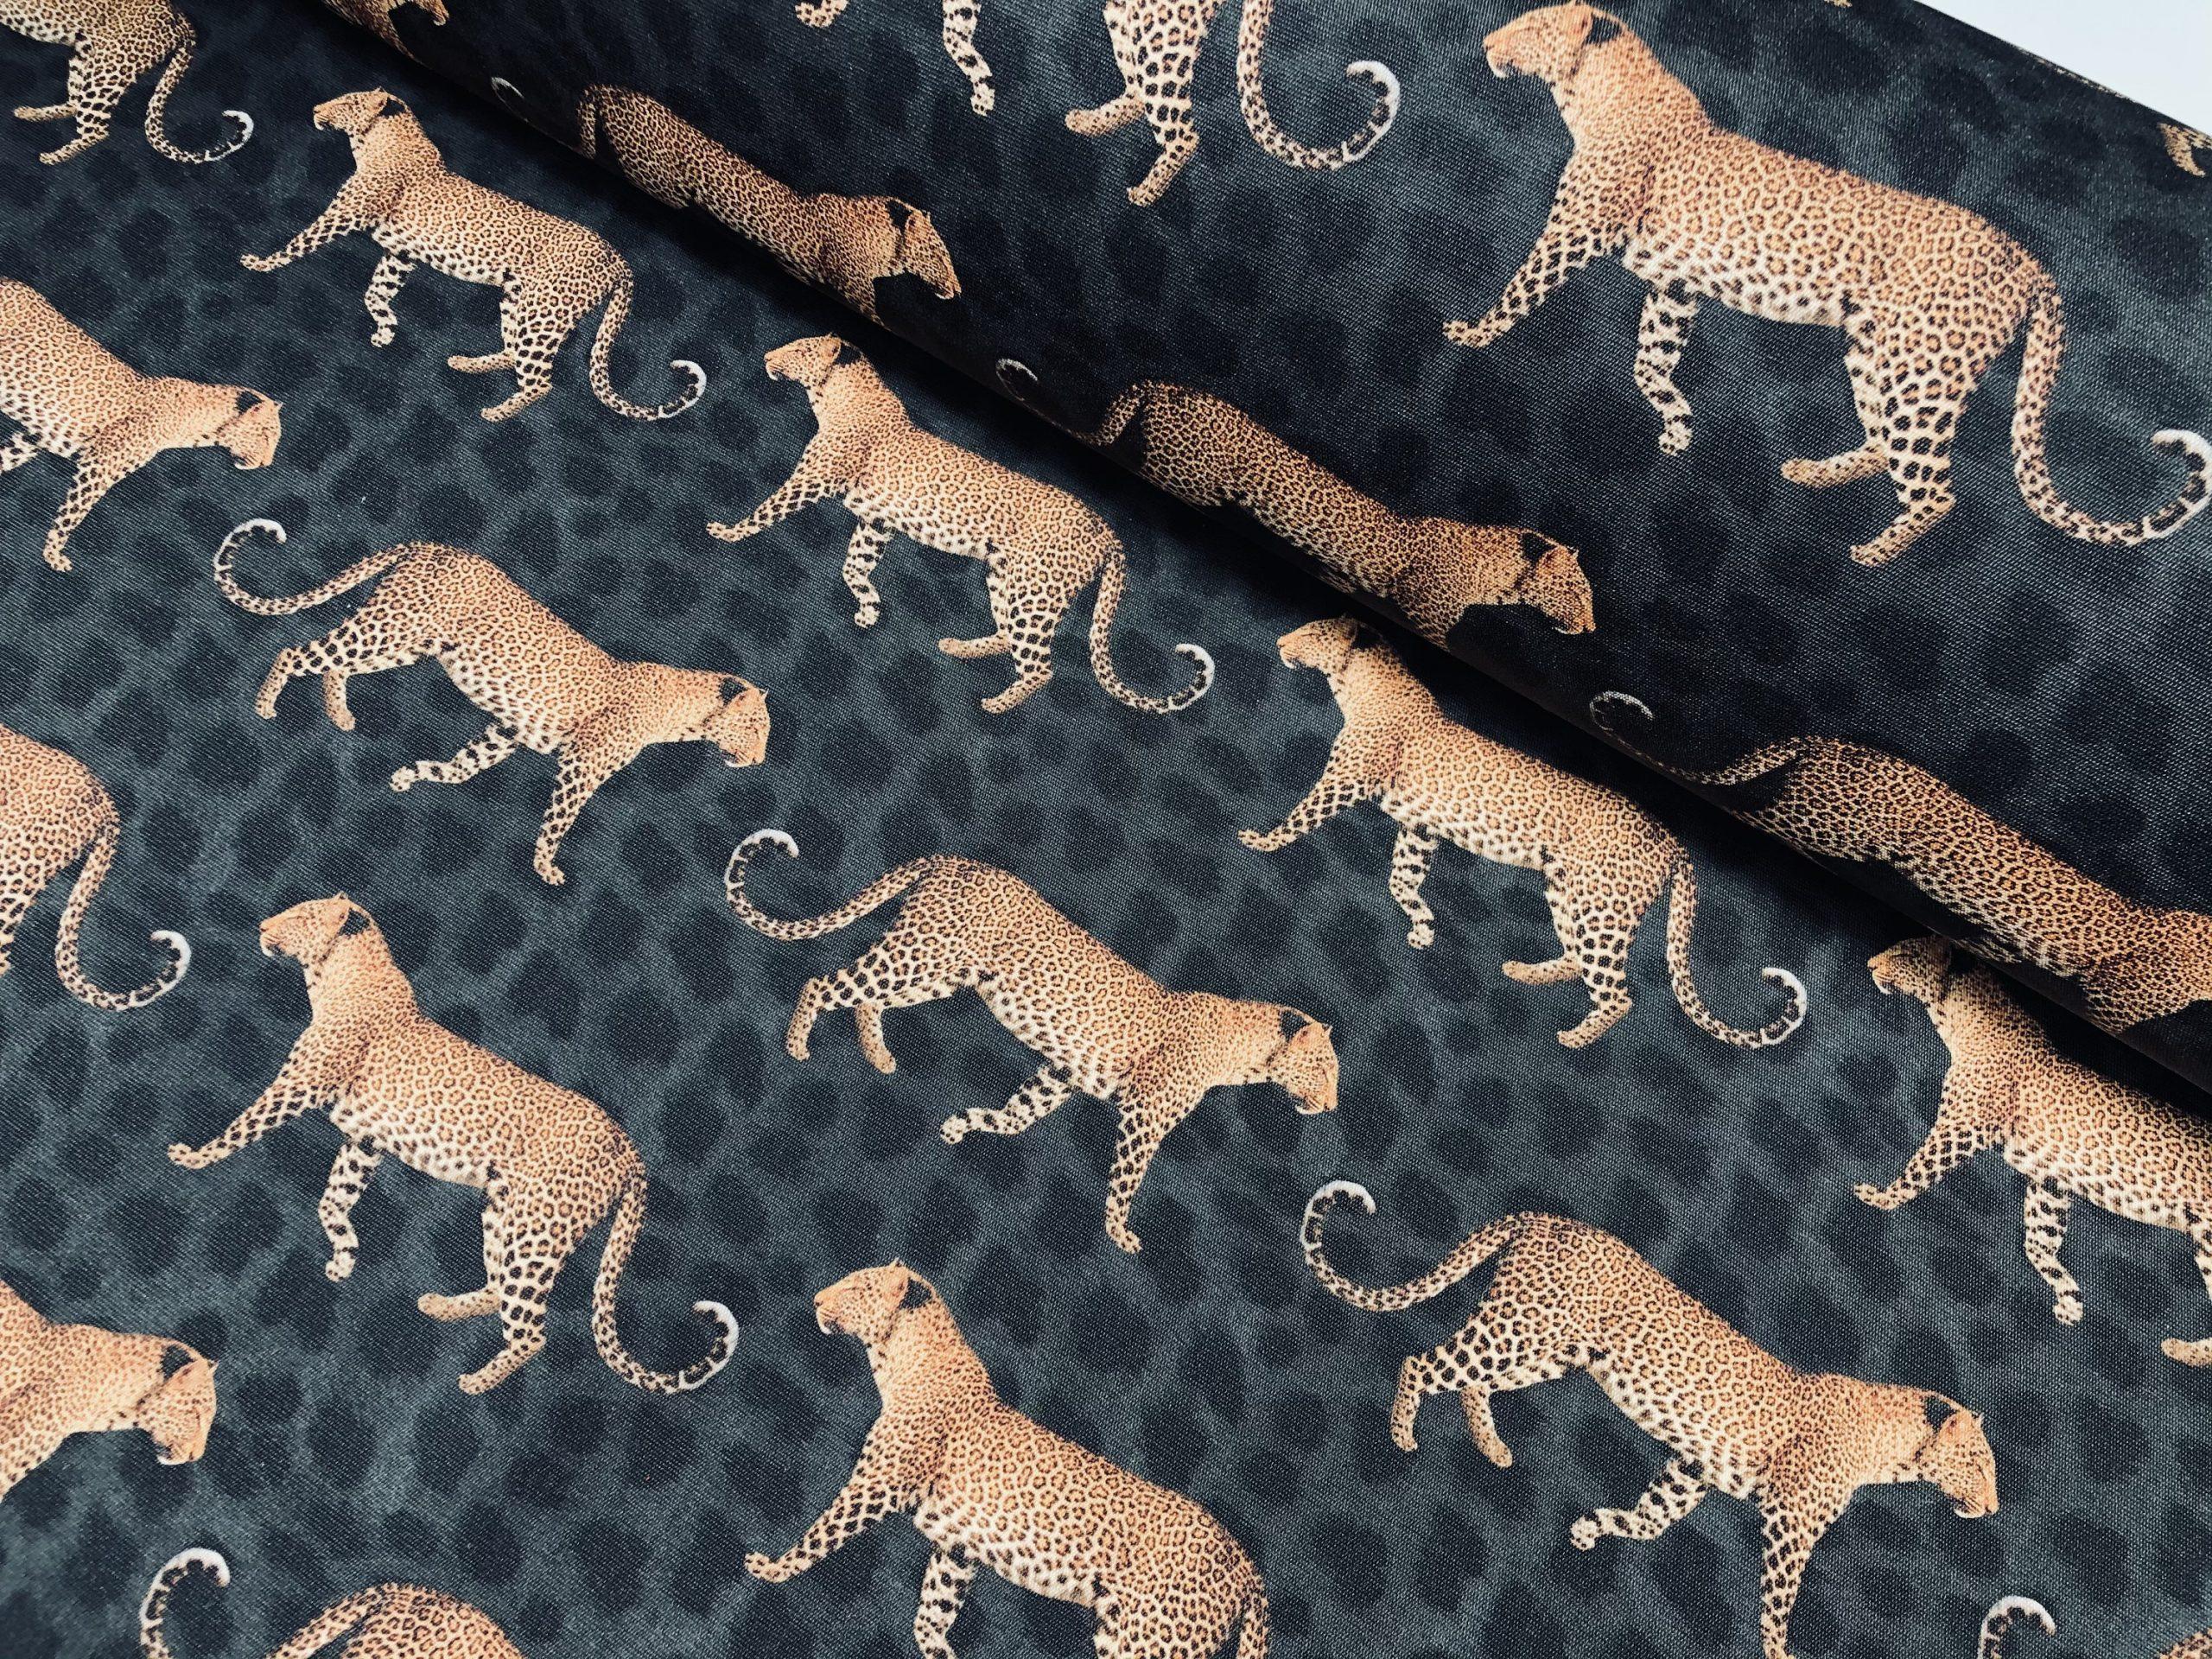 "Leopard Parade DRALON Outdoor Fabric Digital Print Acrylic Teflon Waterproof Upholstery Material For Cushion Gazebo Beach – 55""/140cm Wide"